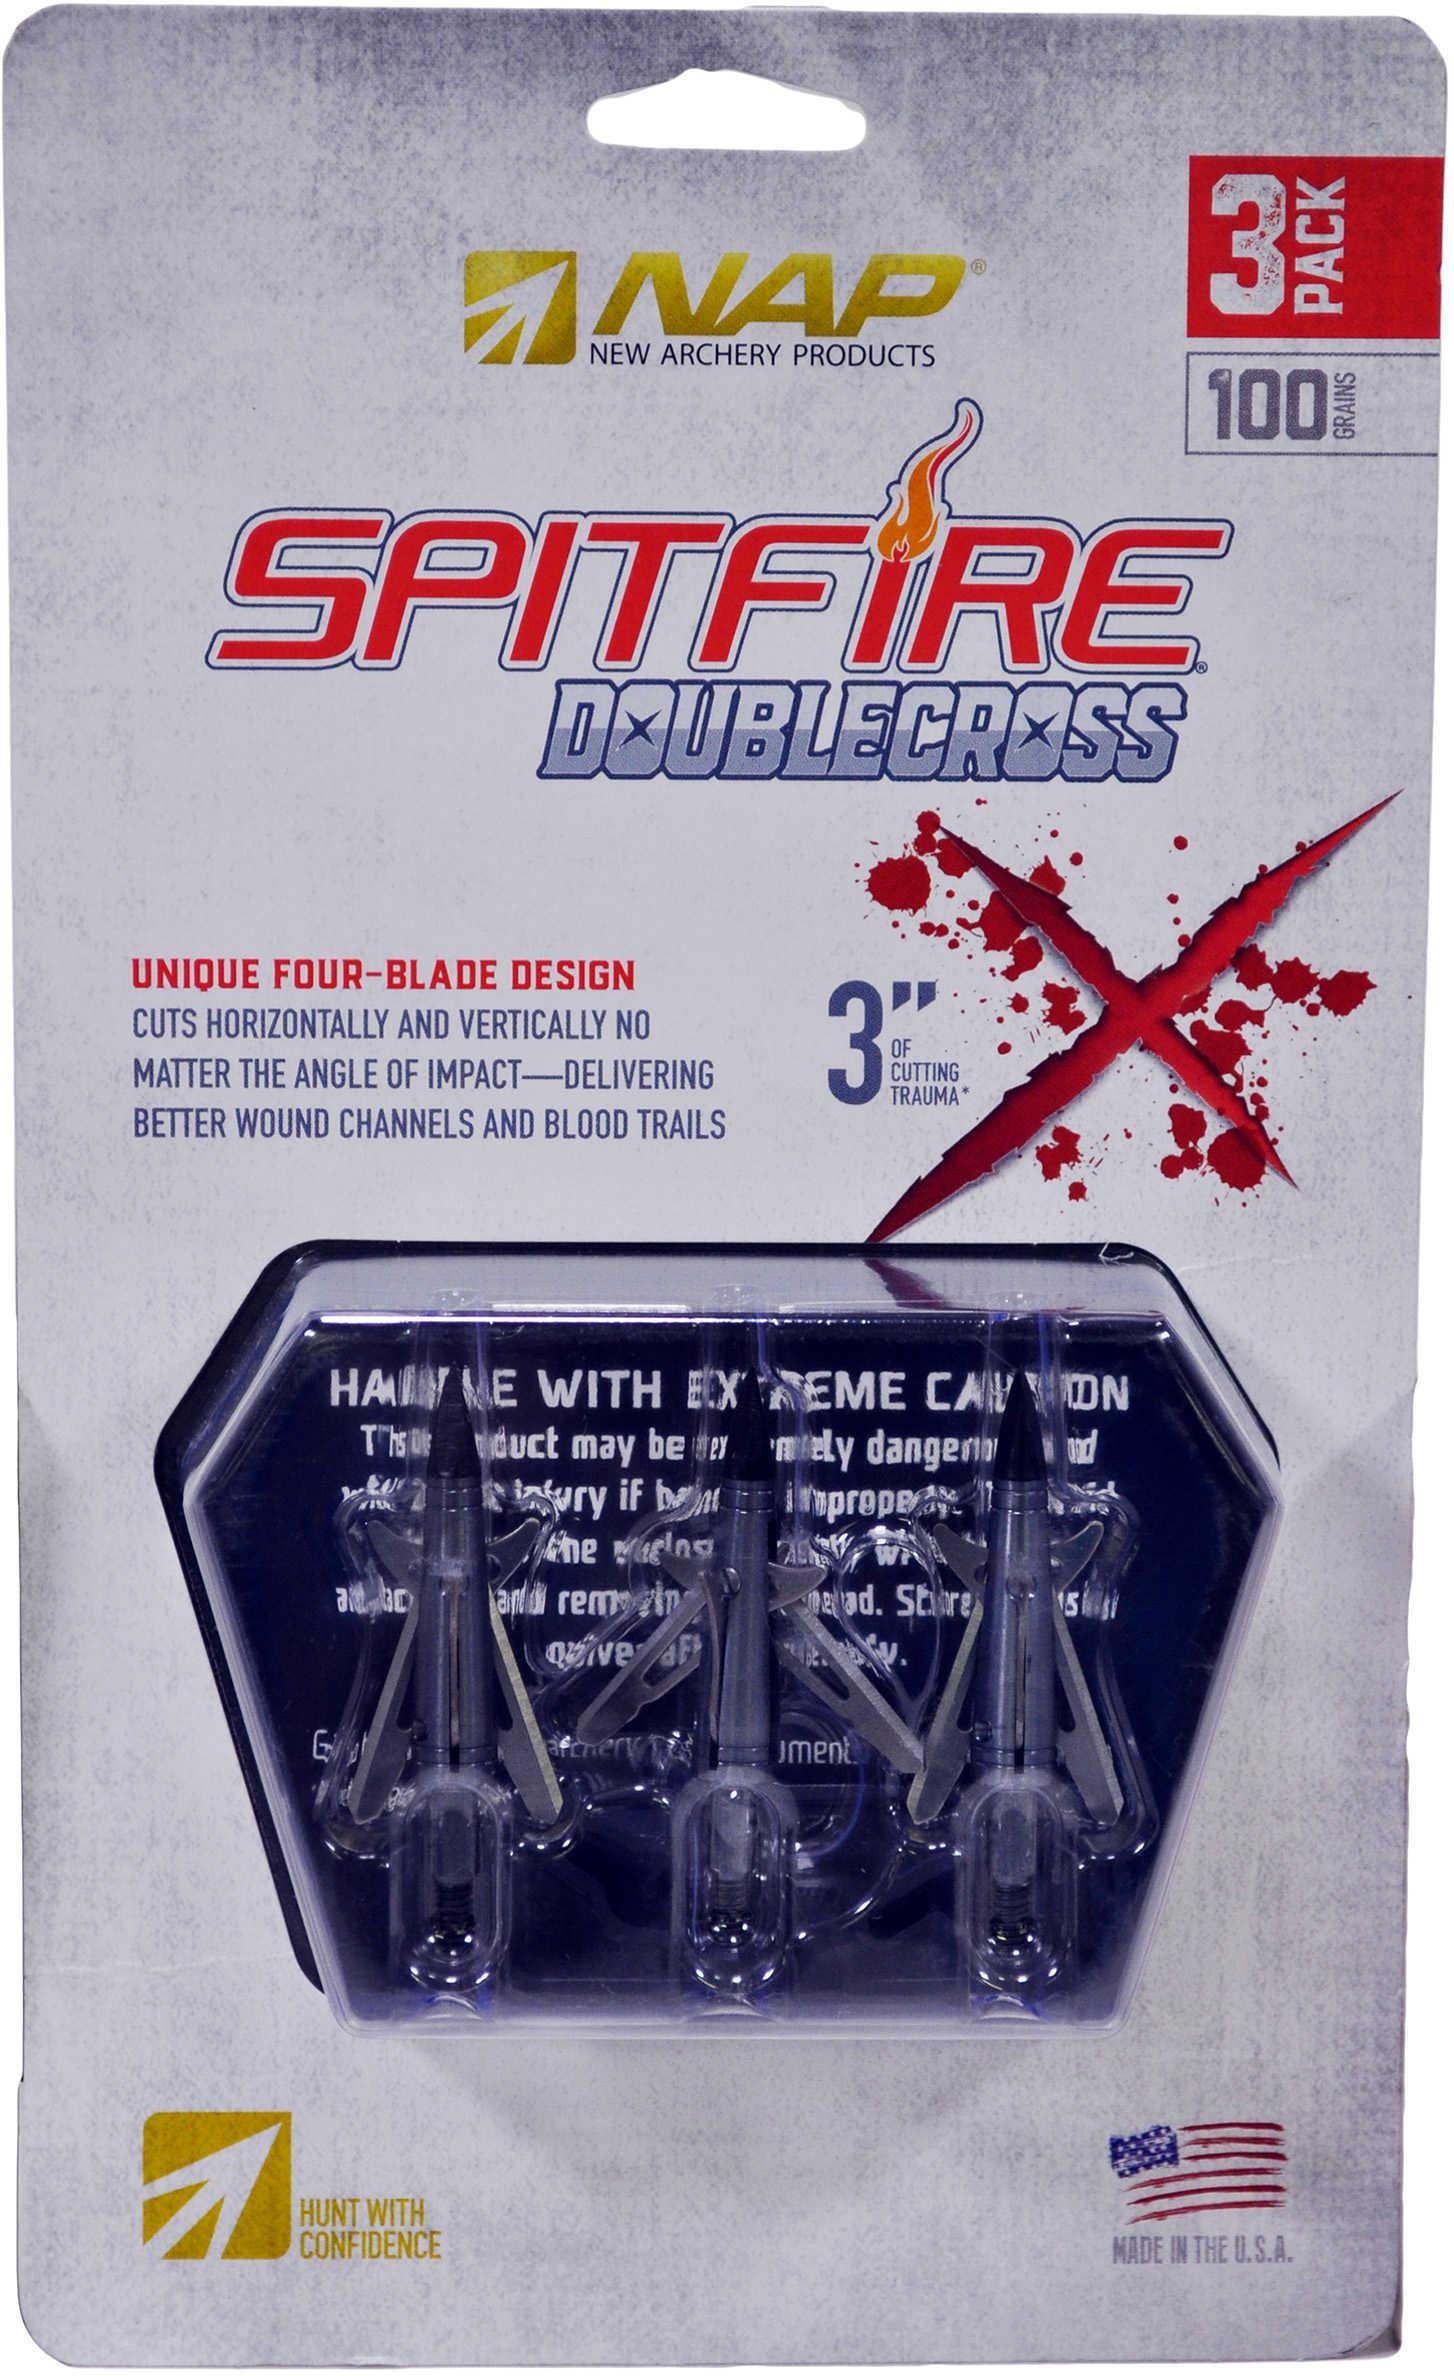 NAP Spitfire DoubleCross Broadhead 100 gr. 3 pk. Model: 60-086